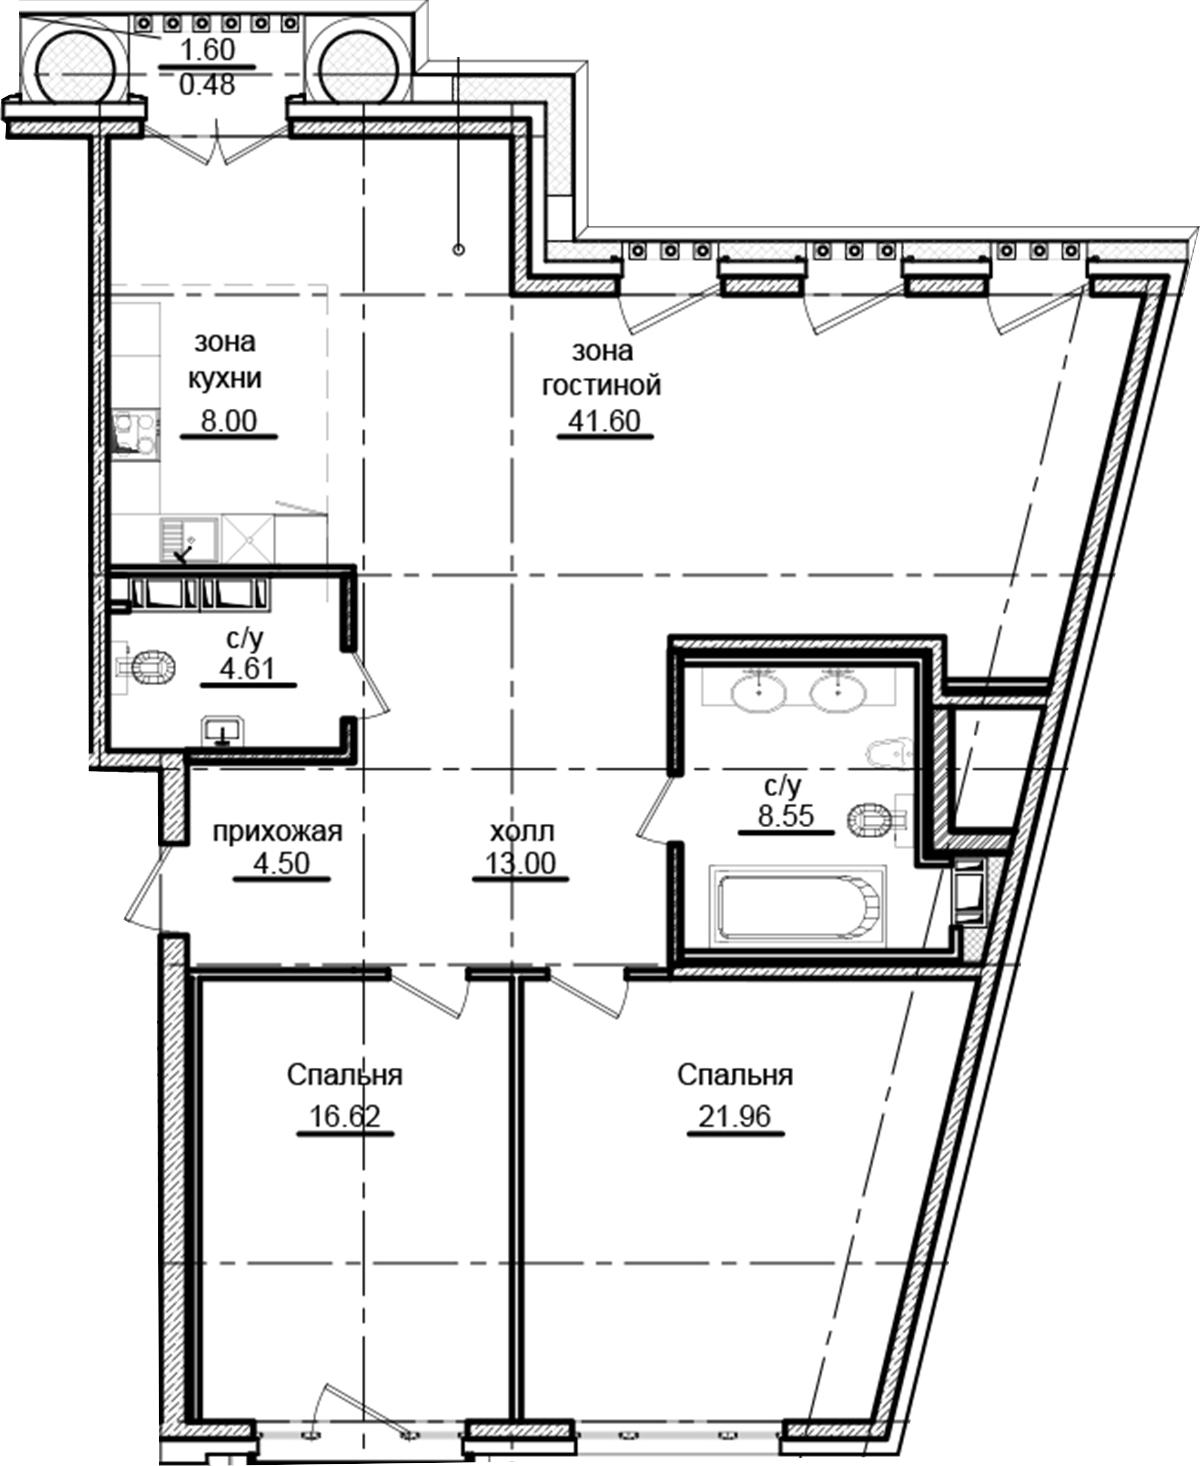 3Е-к.кв, 119.32 м²